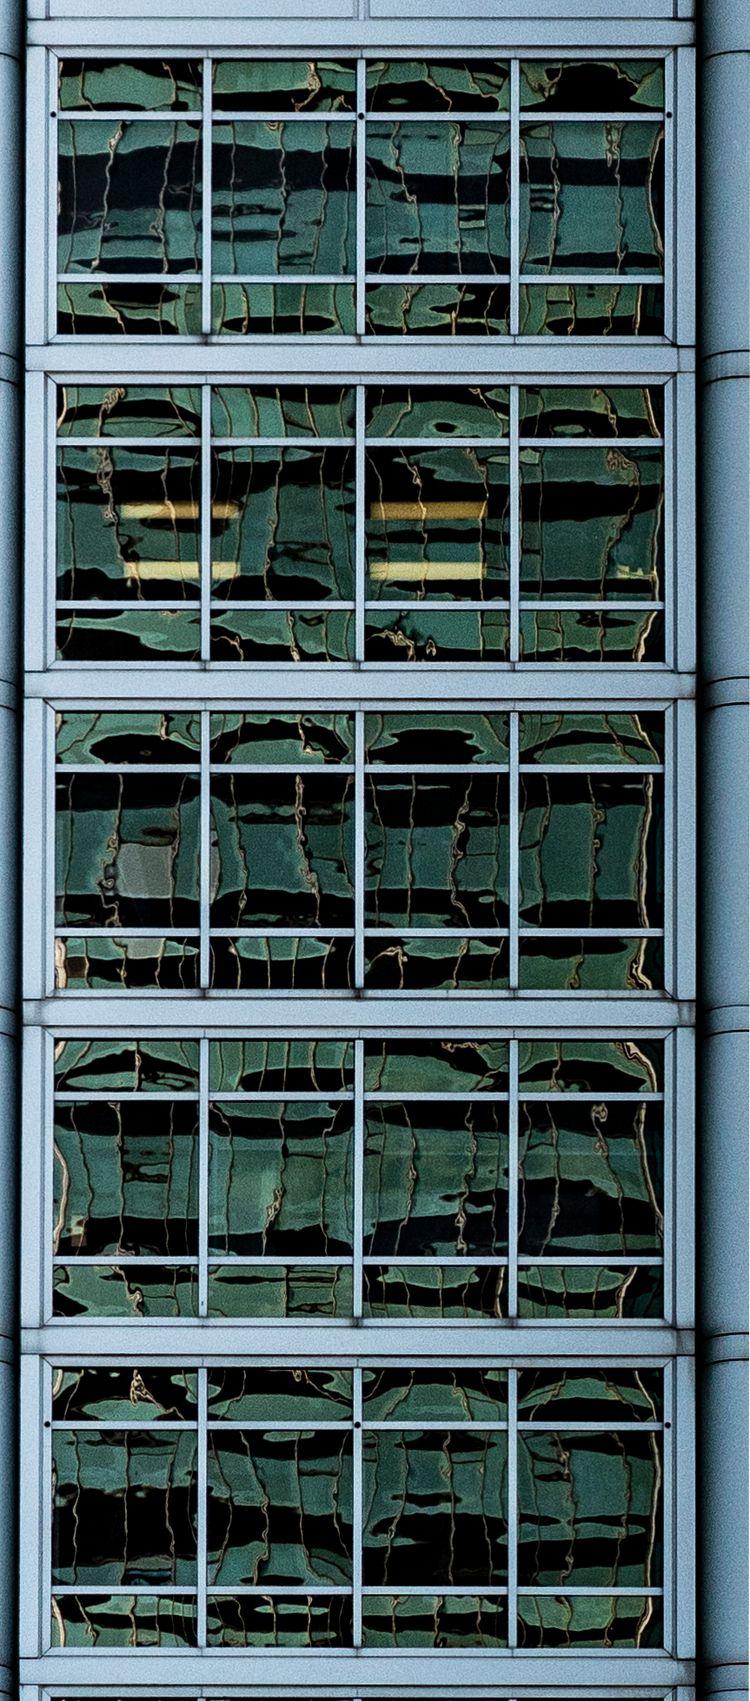 Swimming reflection glance, win - notabene | ello